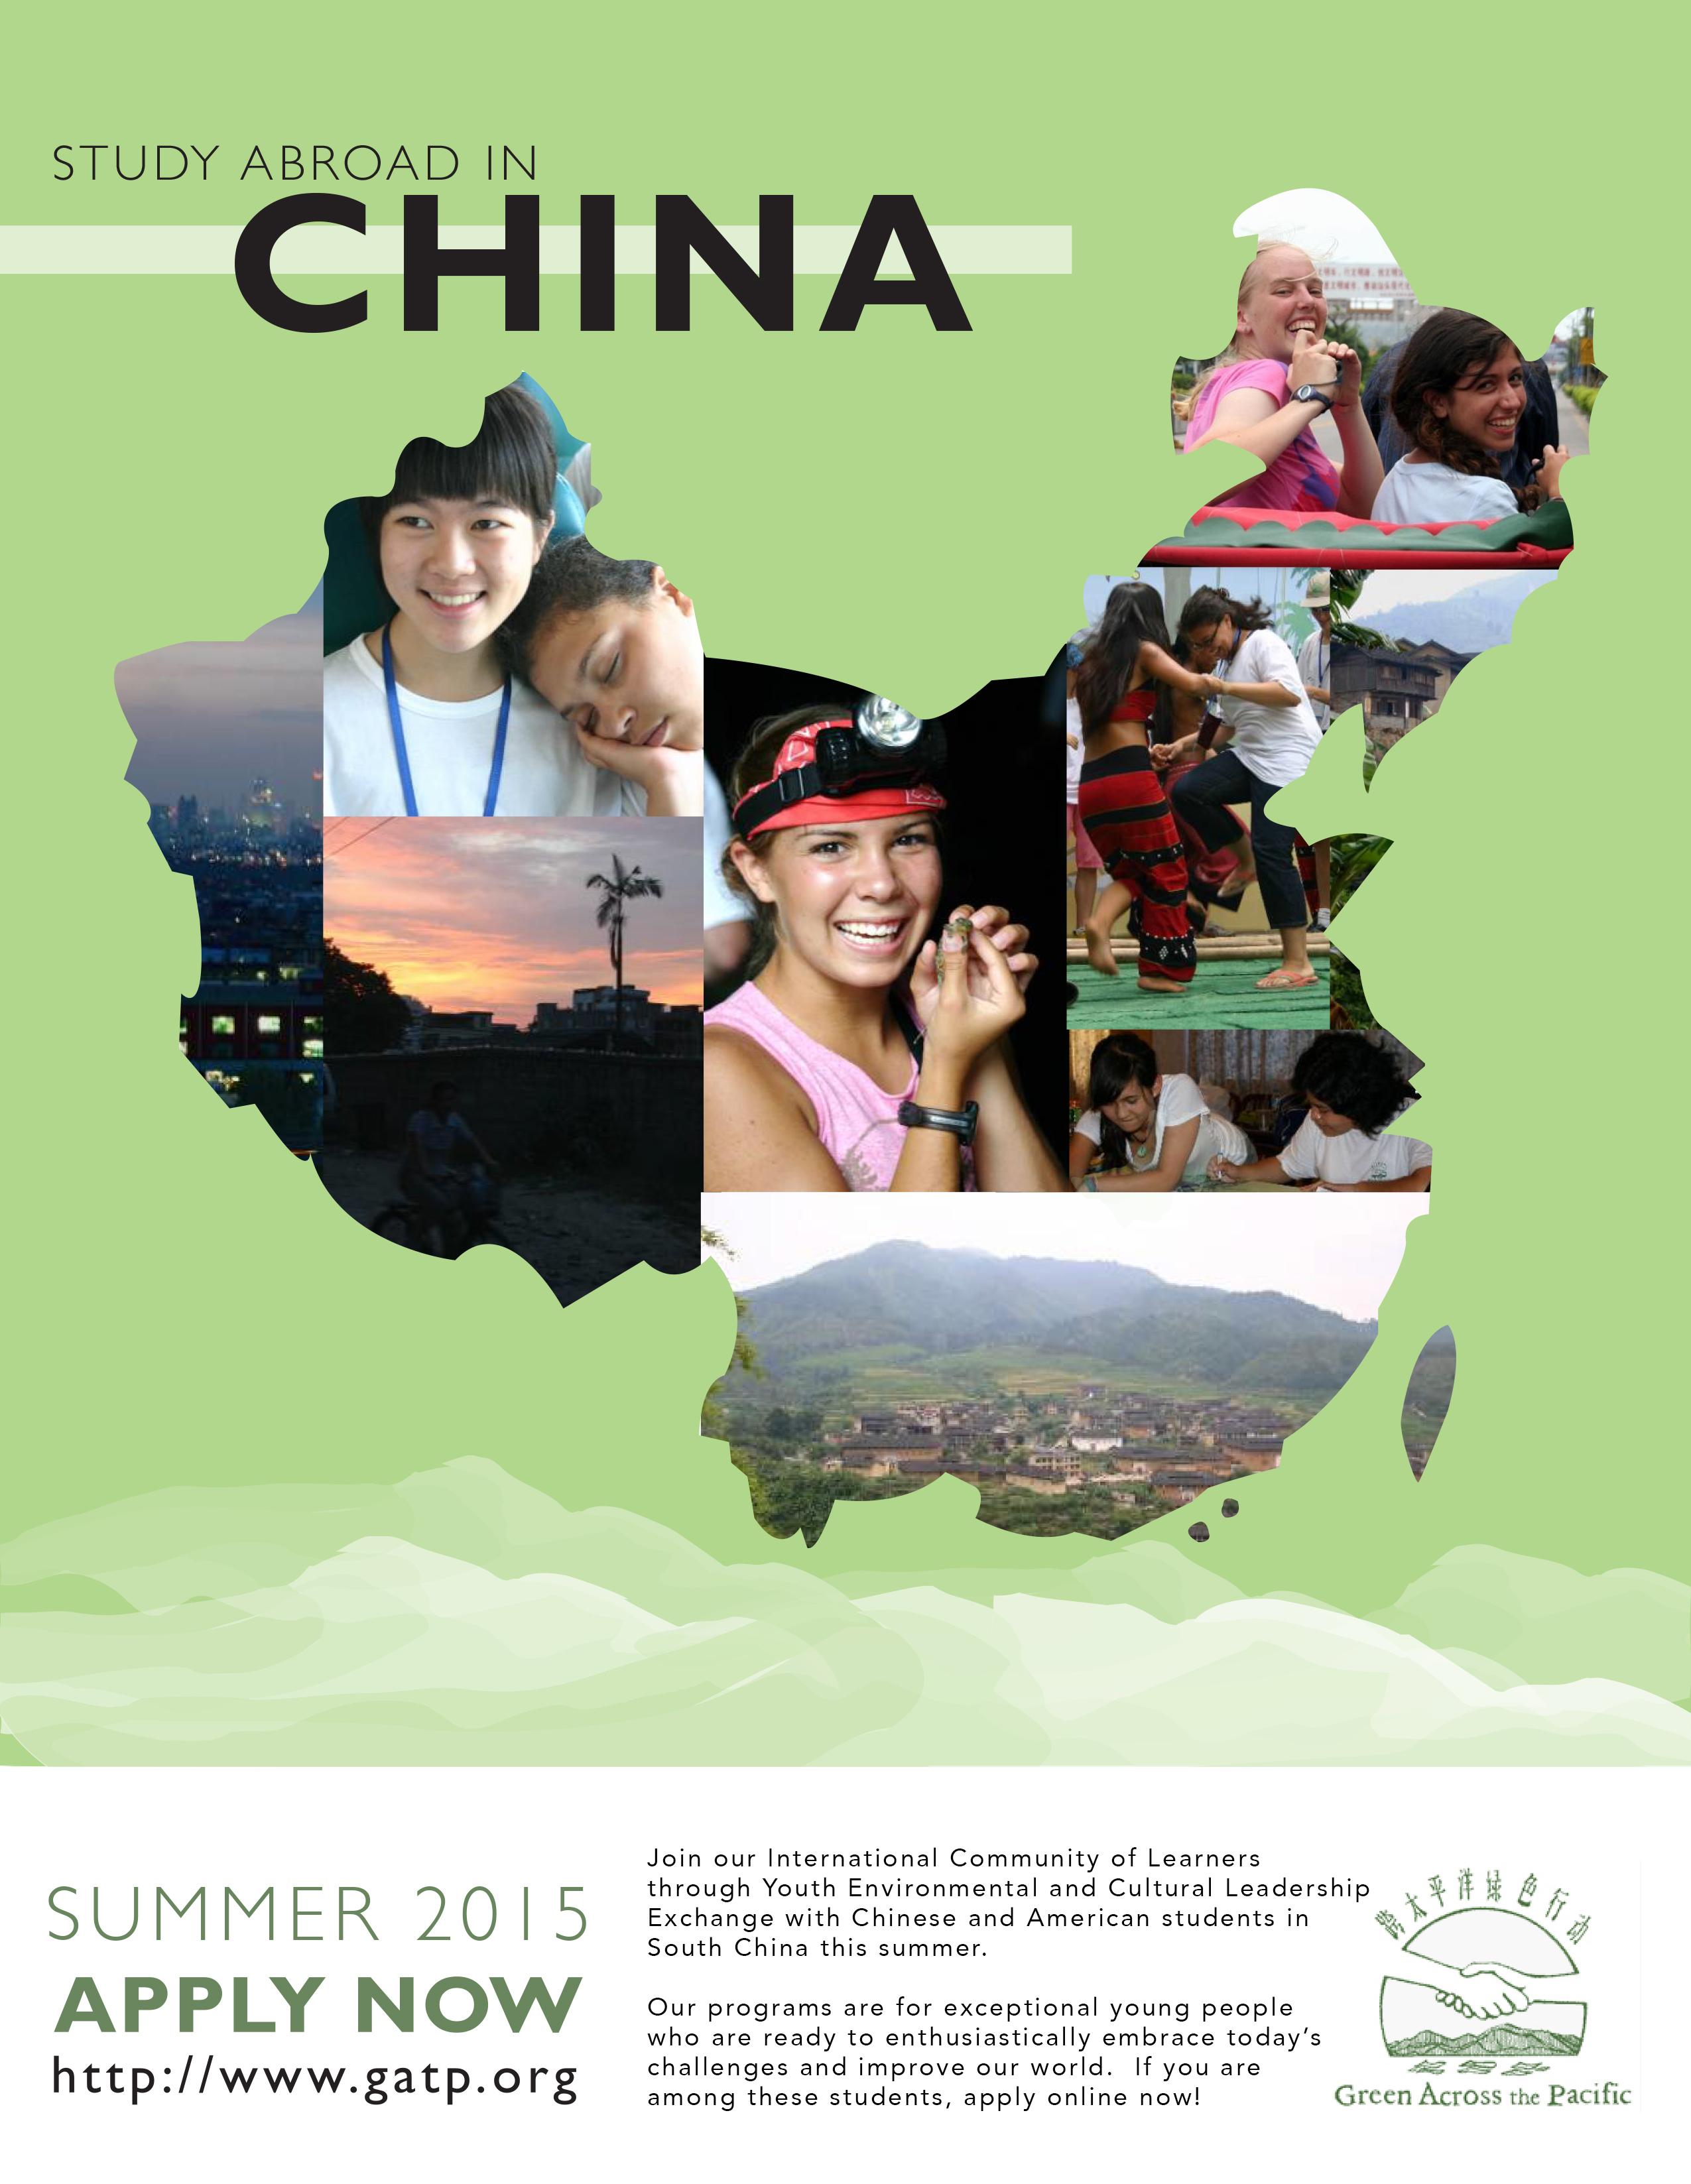 GATP_China_15_Poster